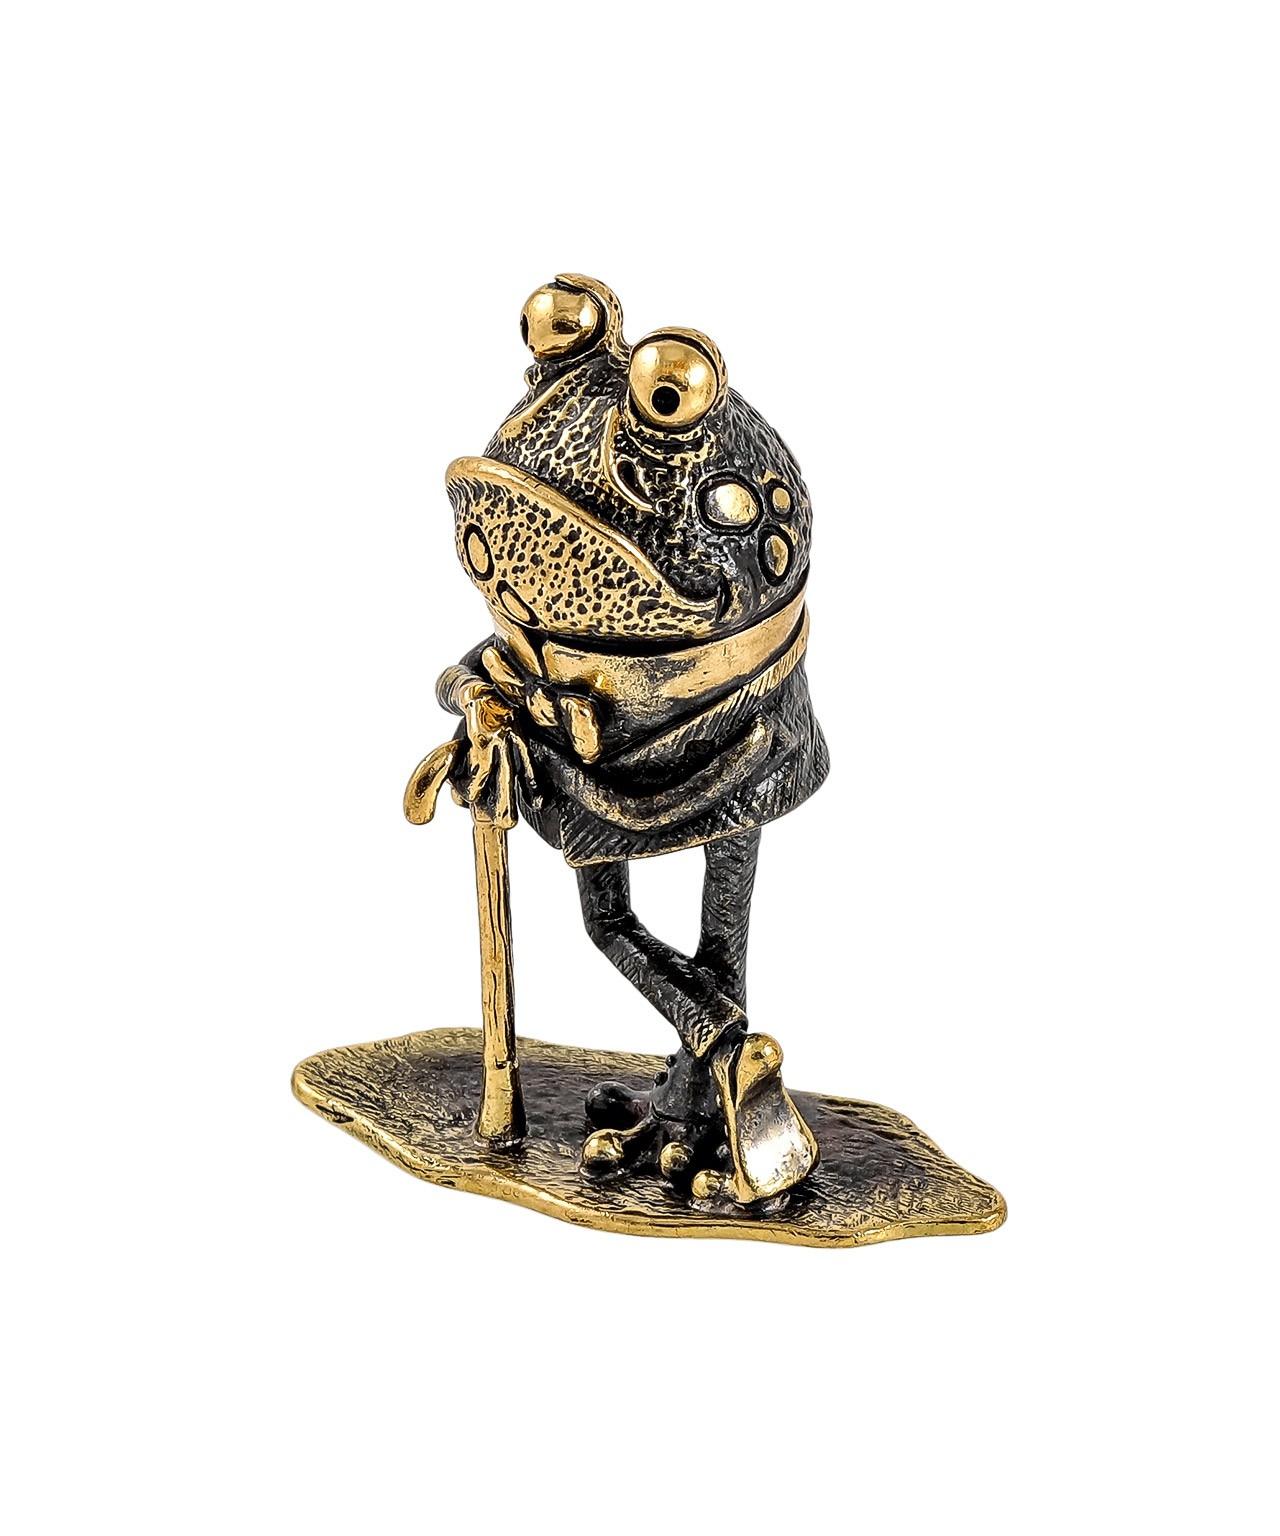 Лягушка Джентльмен без подставки 1861.1